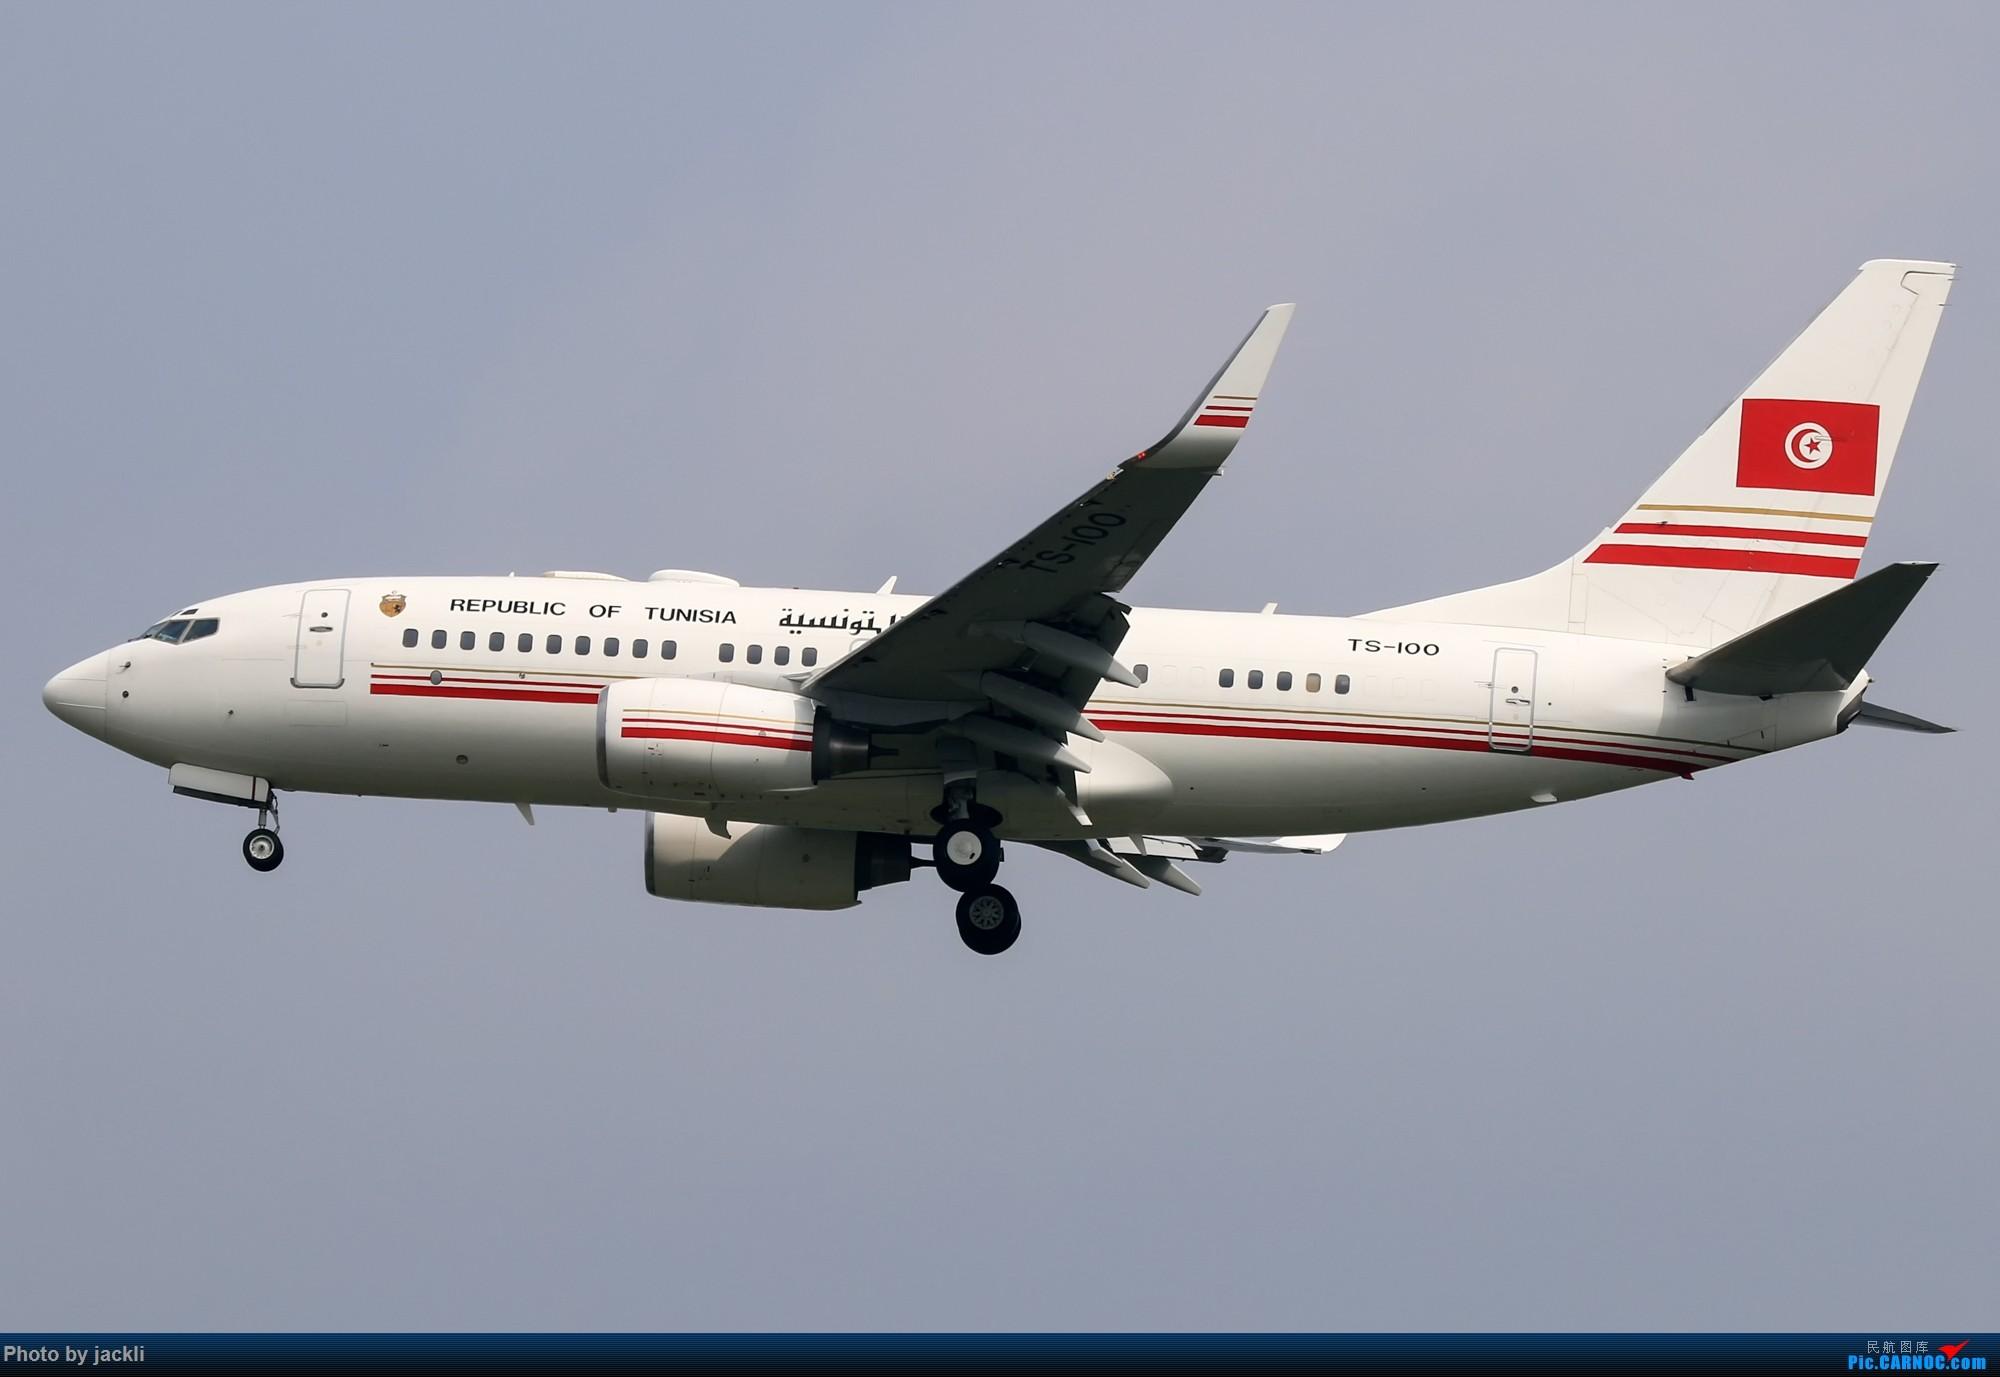 Re:[原创]【JackLi拍机+游记】北京首都机场拍机+参观民航博物馆+首次体验国航A350~ BOEING 737-700 TS-IOO 中国北京首都国际机场